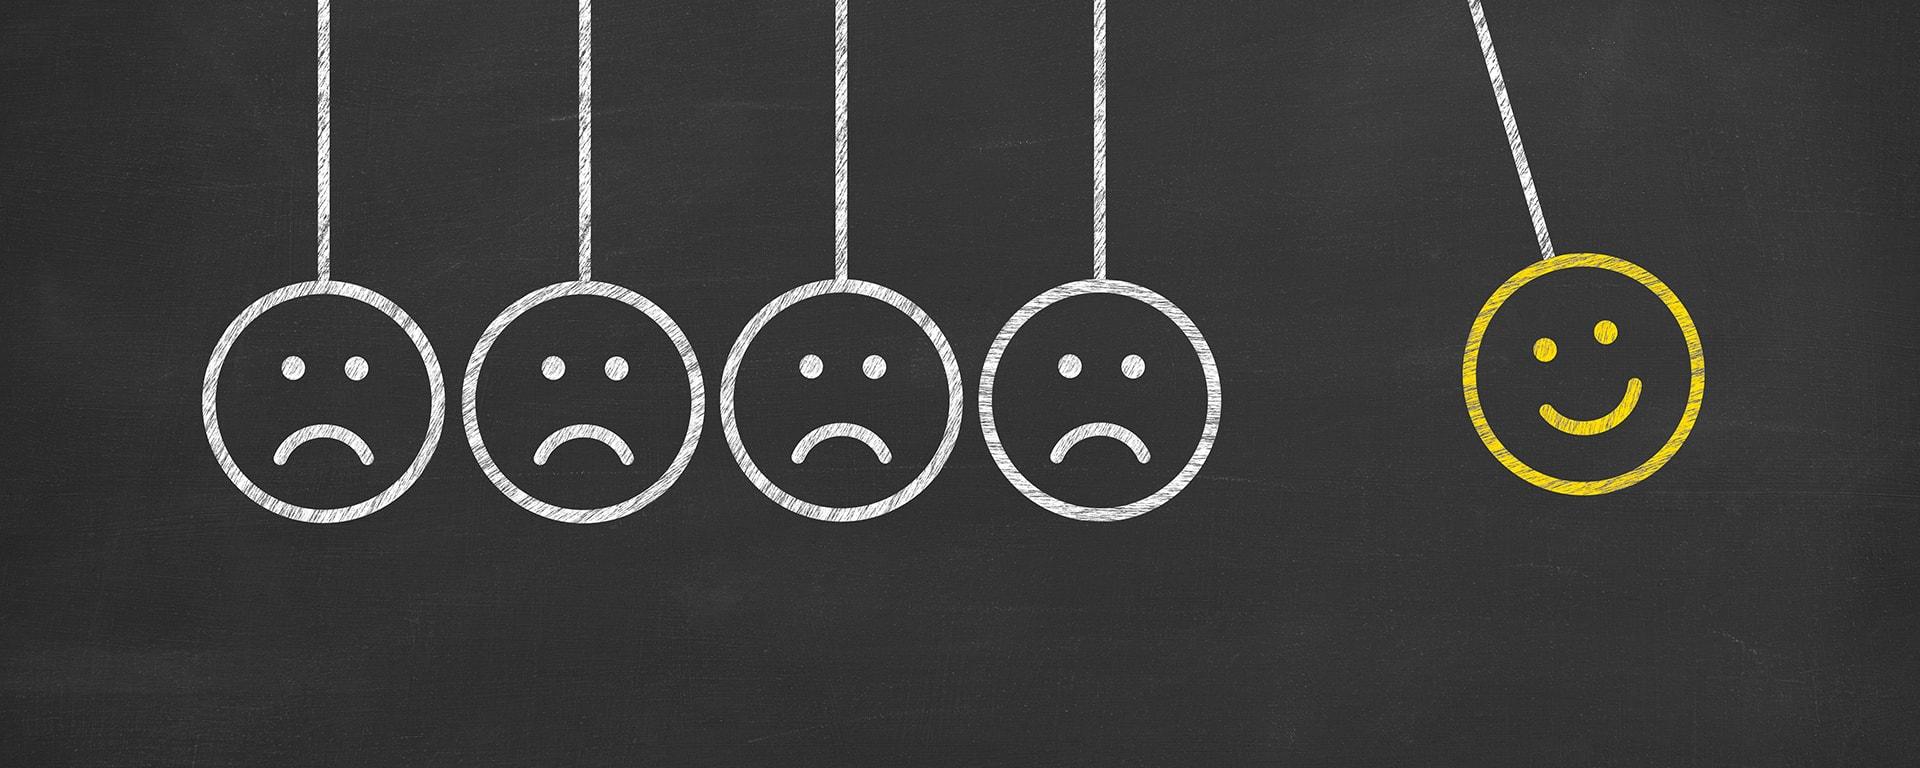 damage customer satisfaction blog image -happy and sad smiley faces